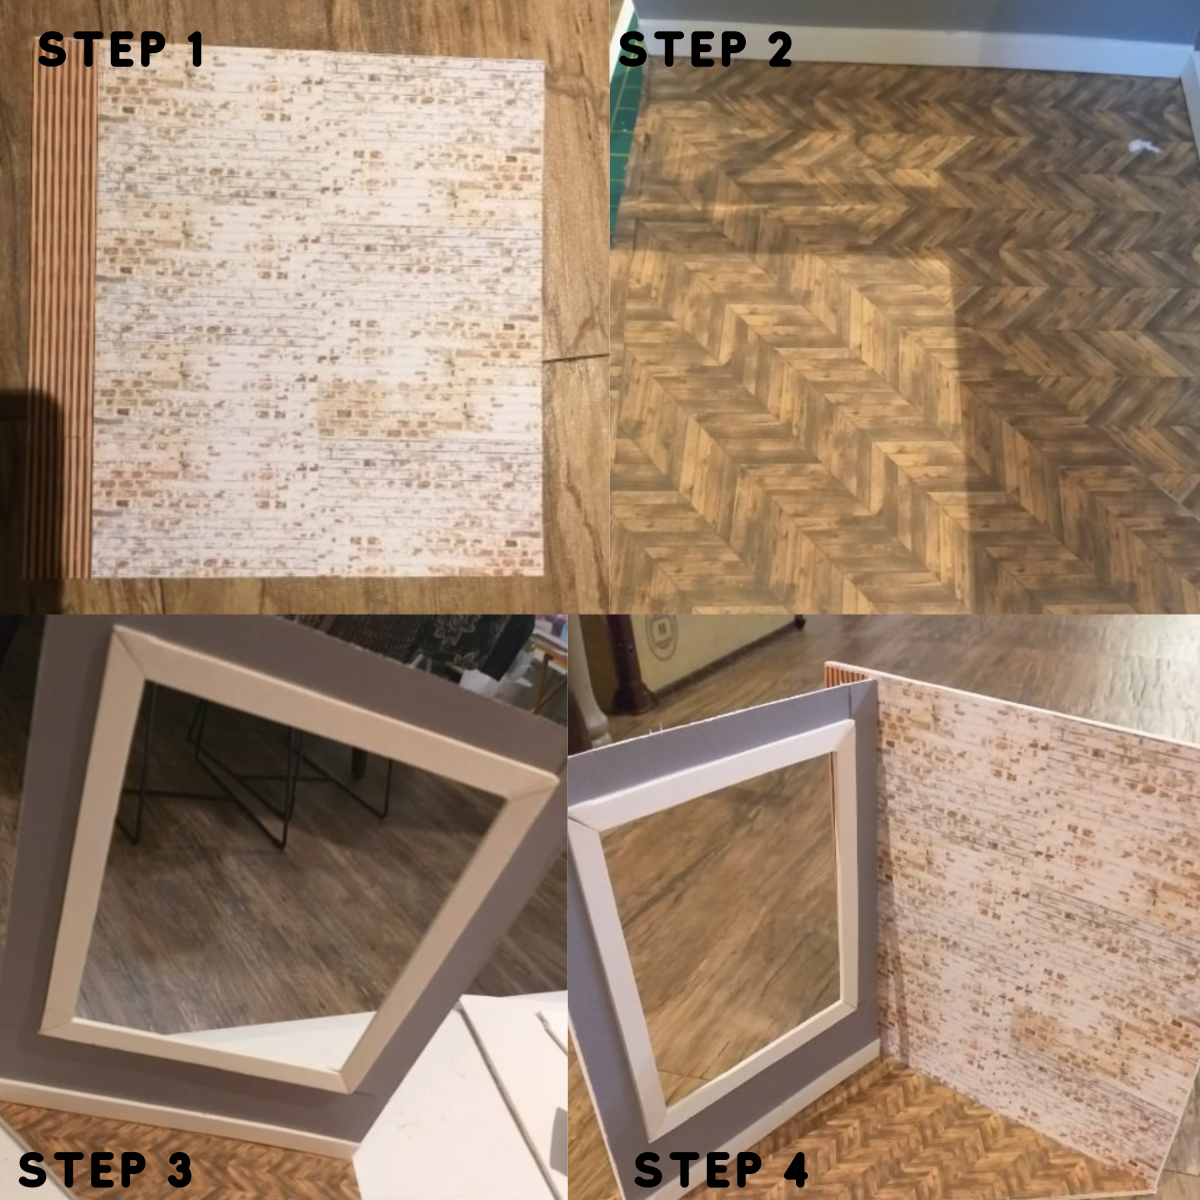 Steps 1 through 4.